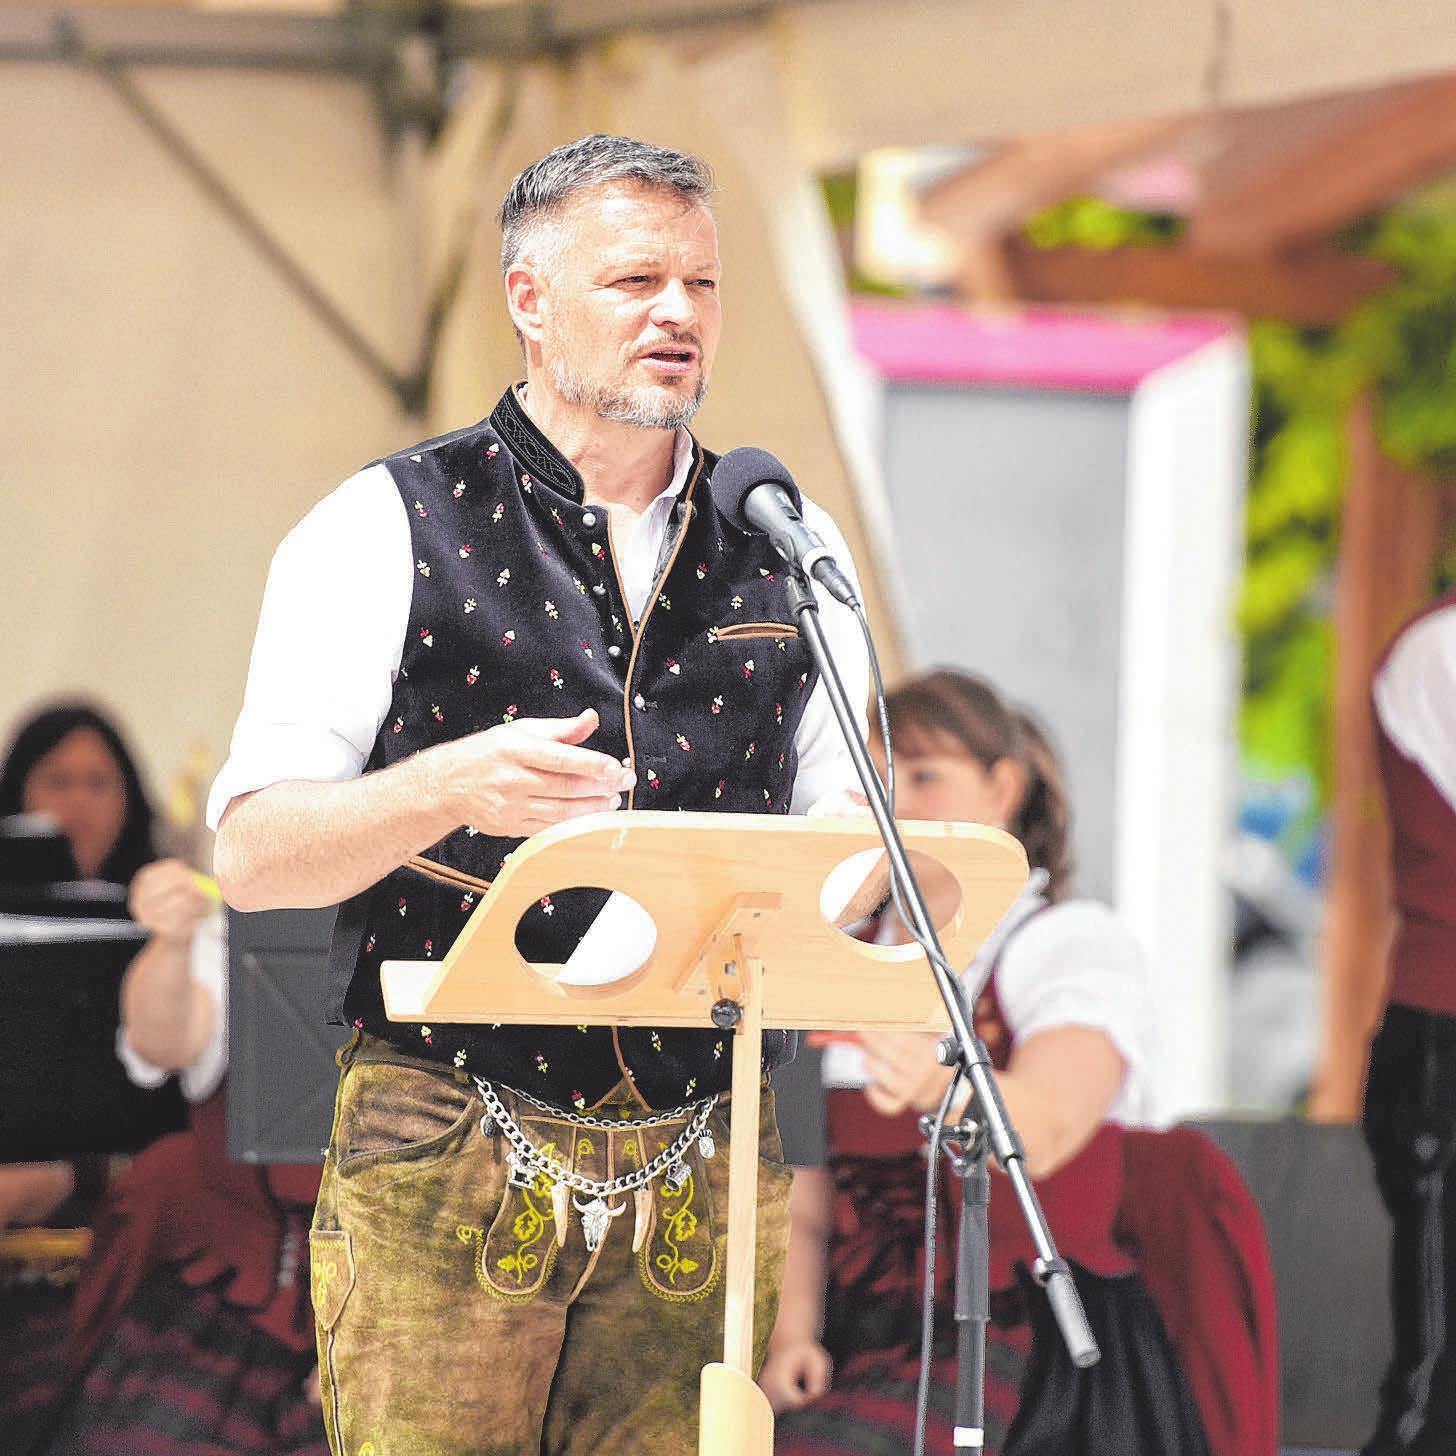 Feiern am Stachus in Nonnenhorn Image 5